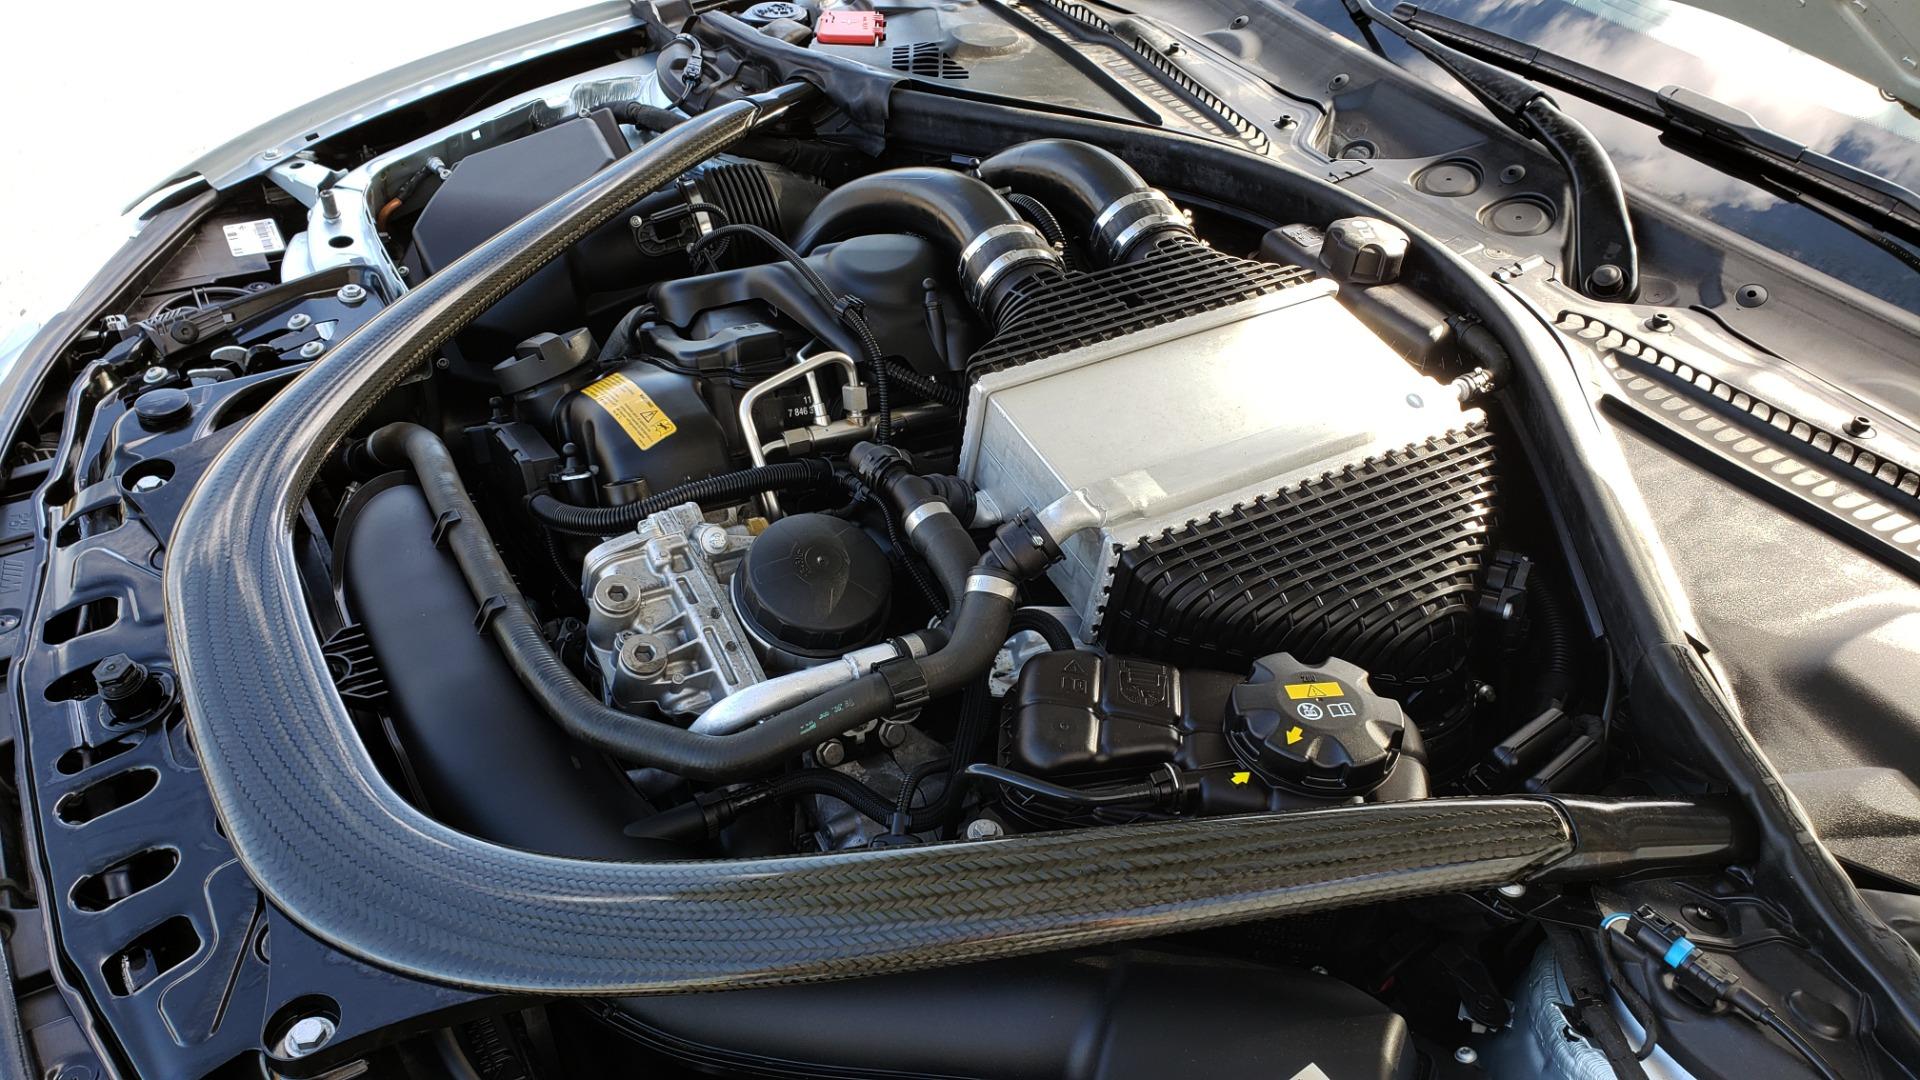 Used 2015 BMW M4 COUPE / EXEC PKG / DRVR ASST PLUS / LIGHTING / M-SUSPENSION for sale Sold at Formula Imports in Charlotte NC 28227 15